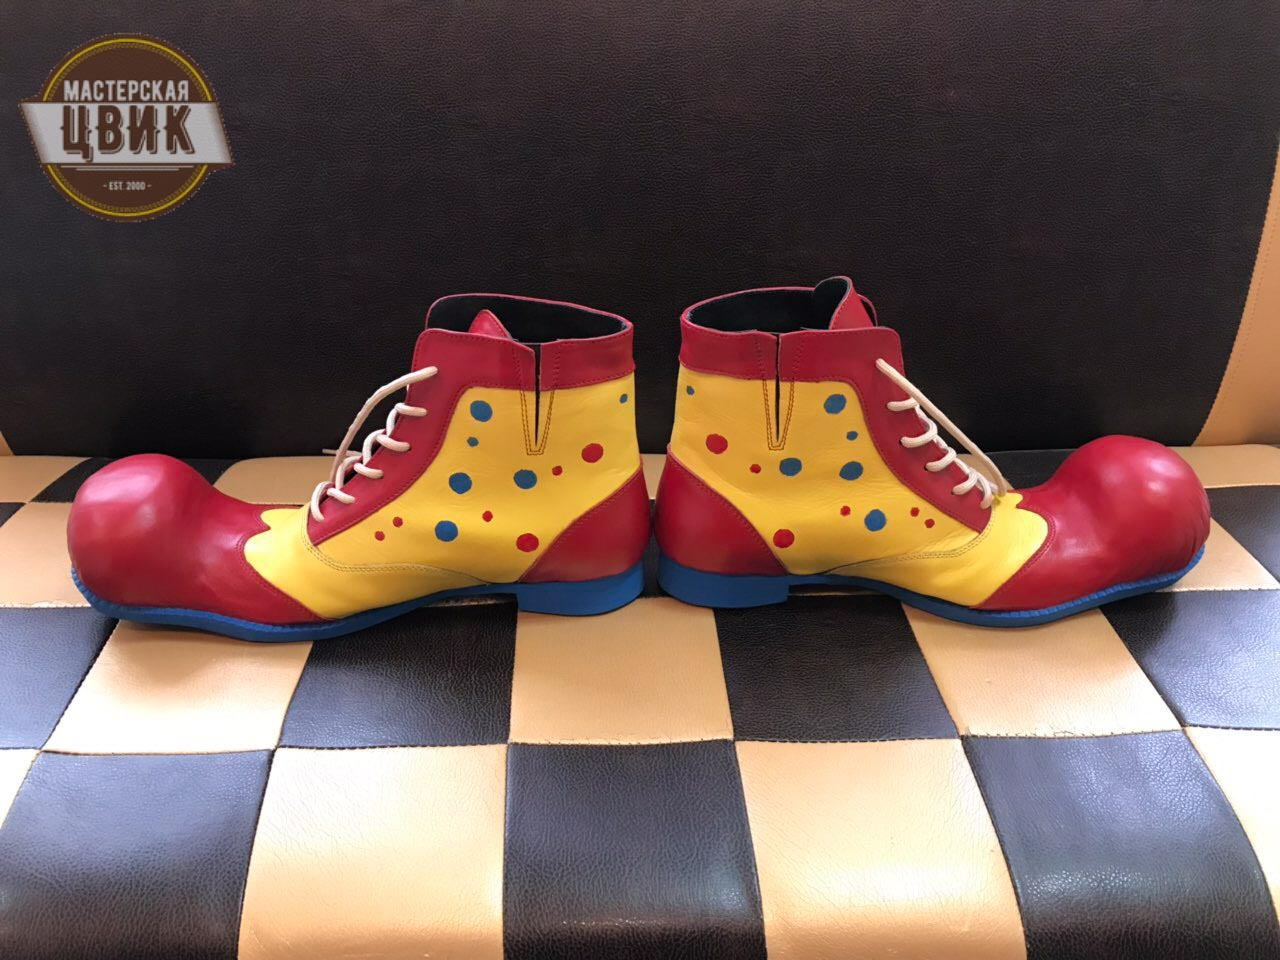 individualnyj-poshiv-obuvi-minsk-73 Индивидуальный пошив обуви